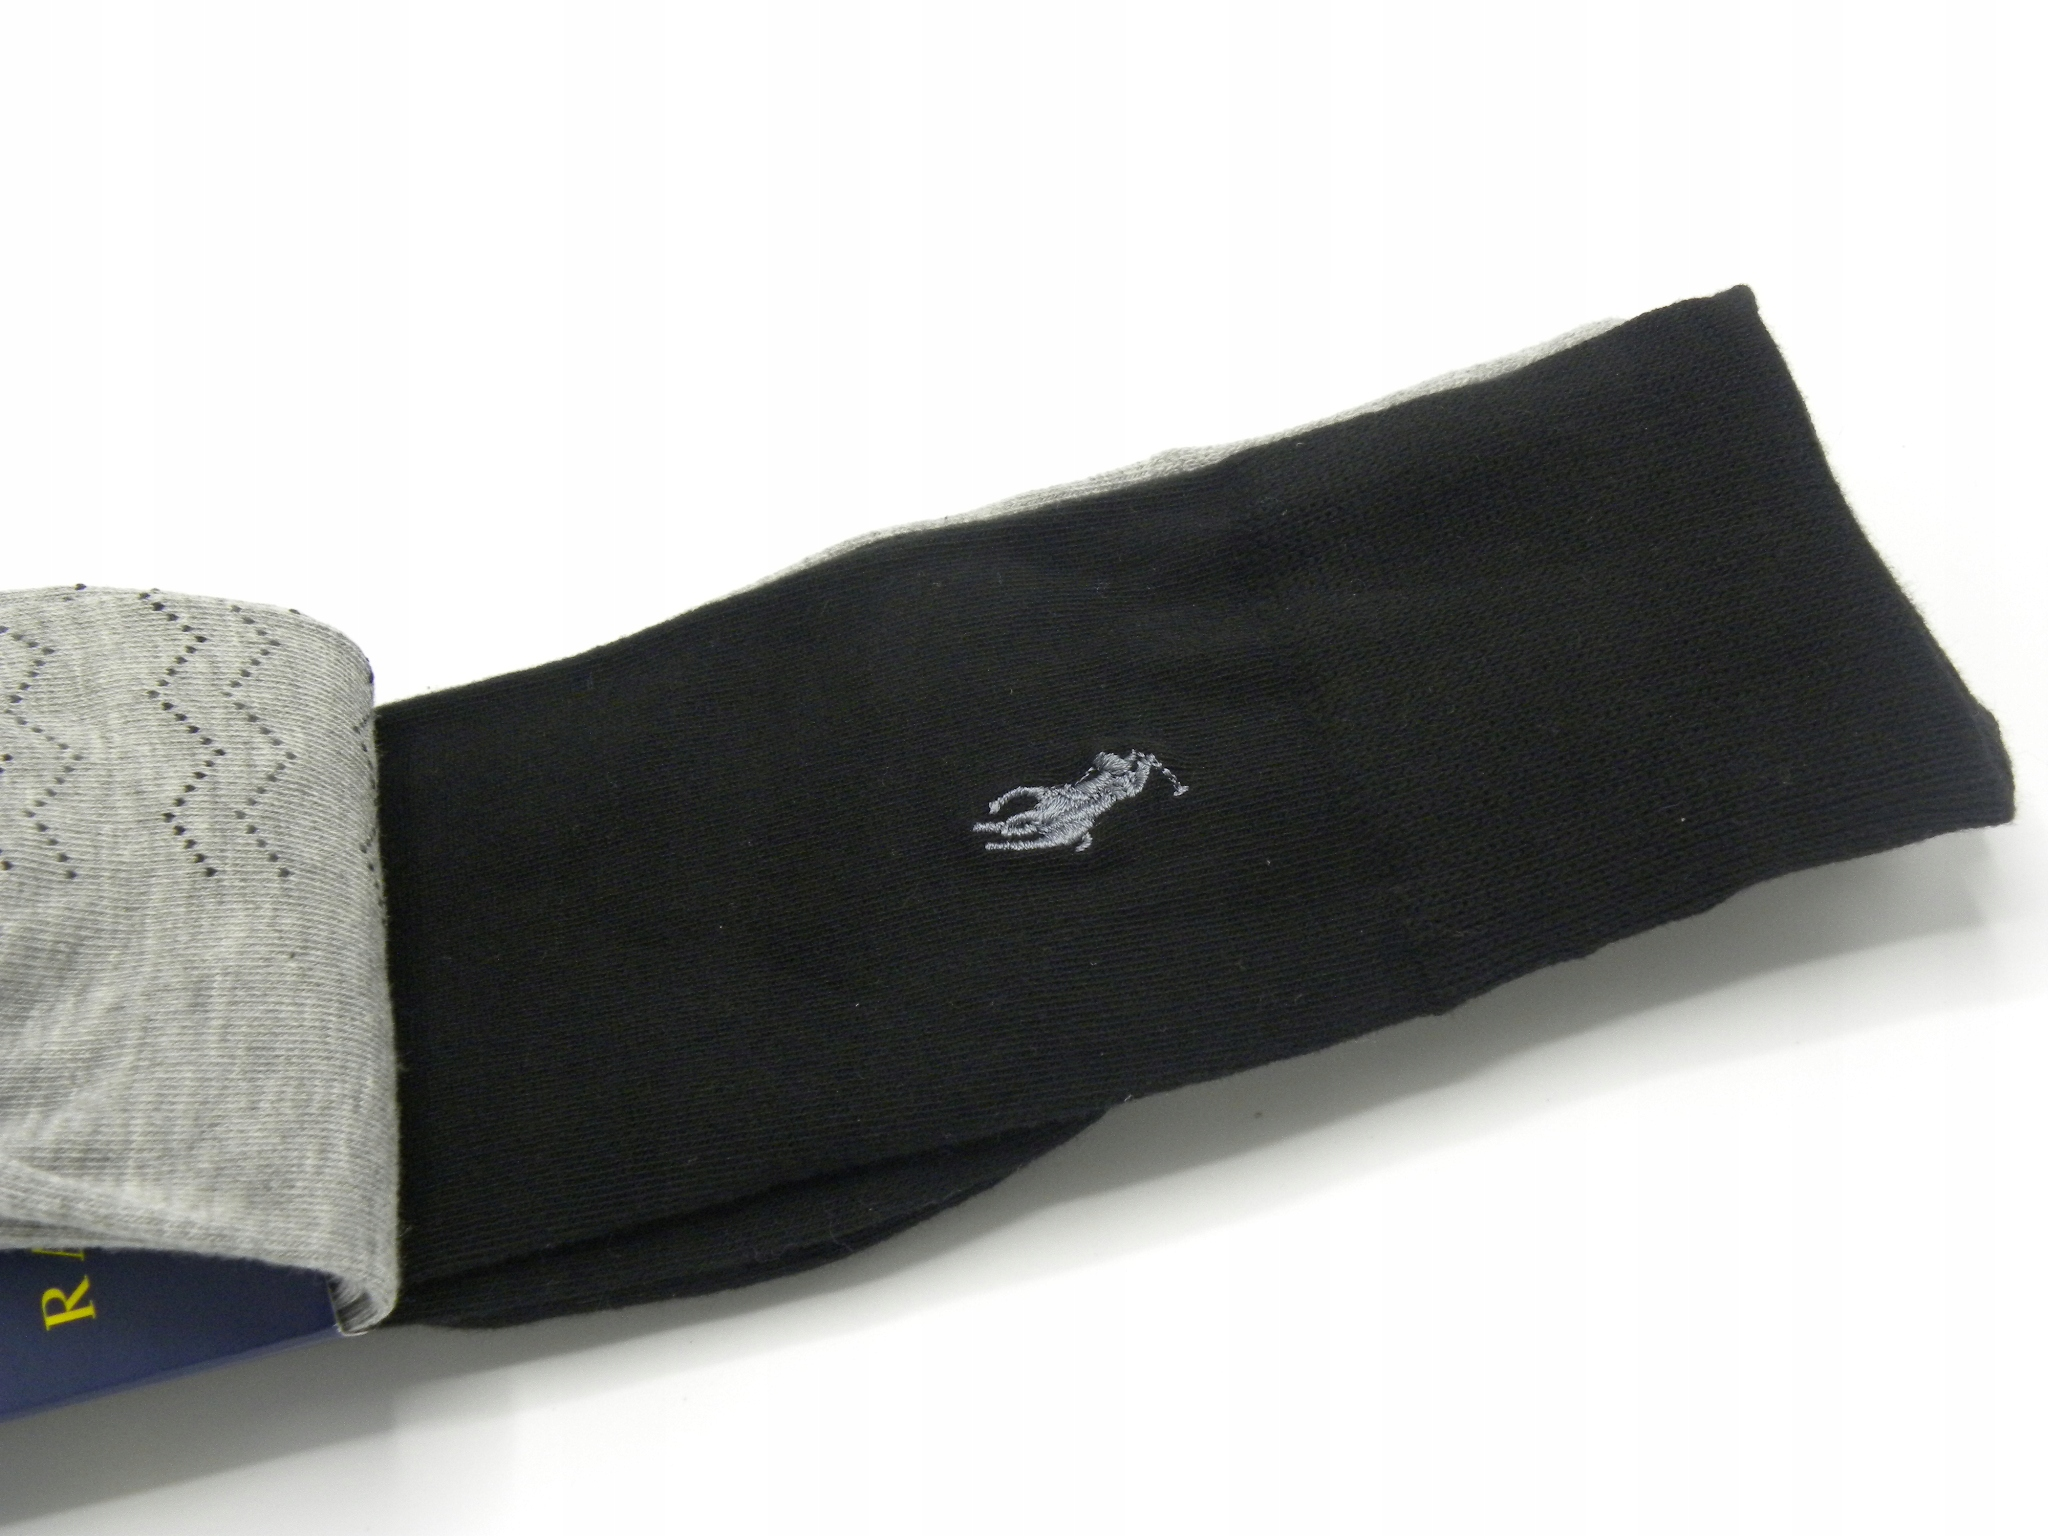 Polo Ralph Lauren 3 pary wysokie skarpetki